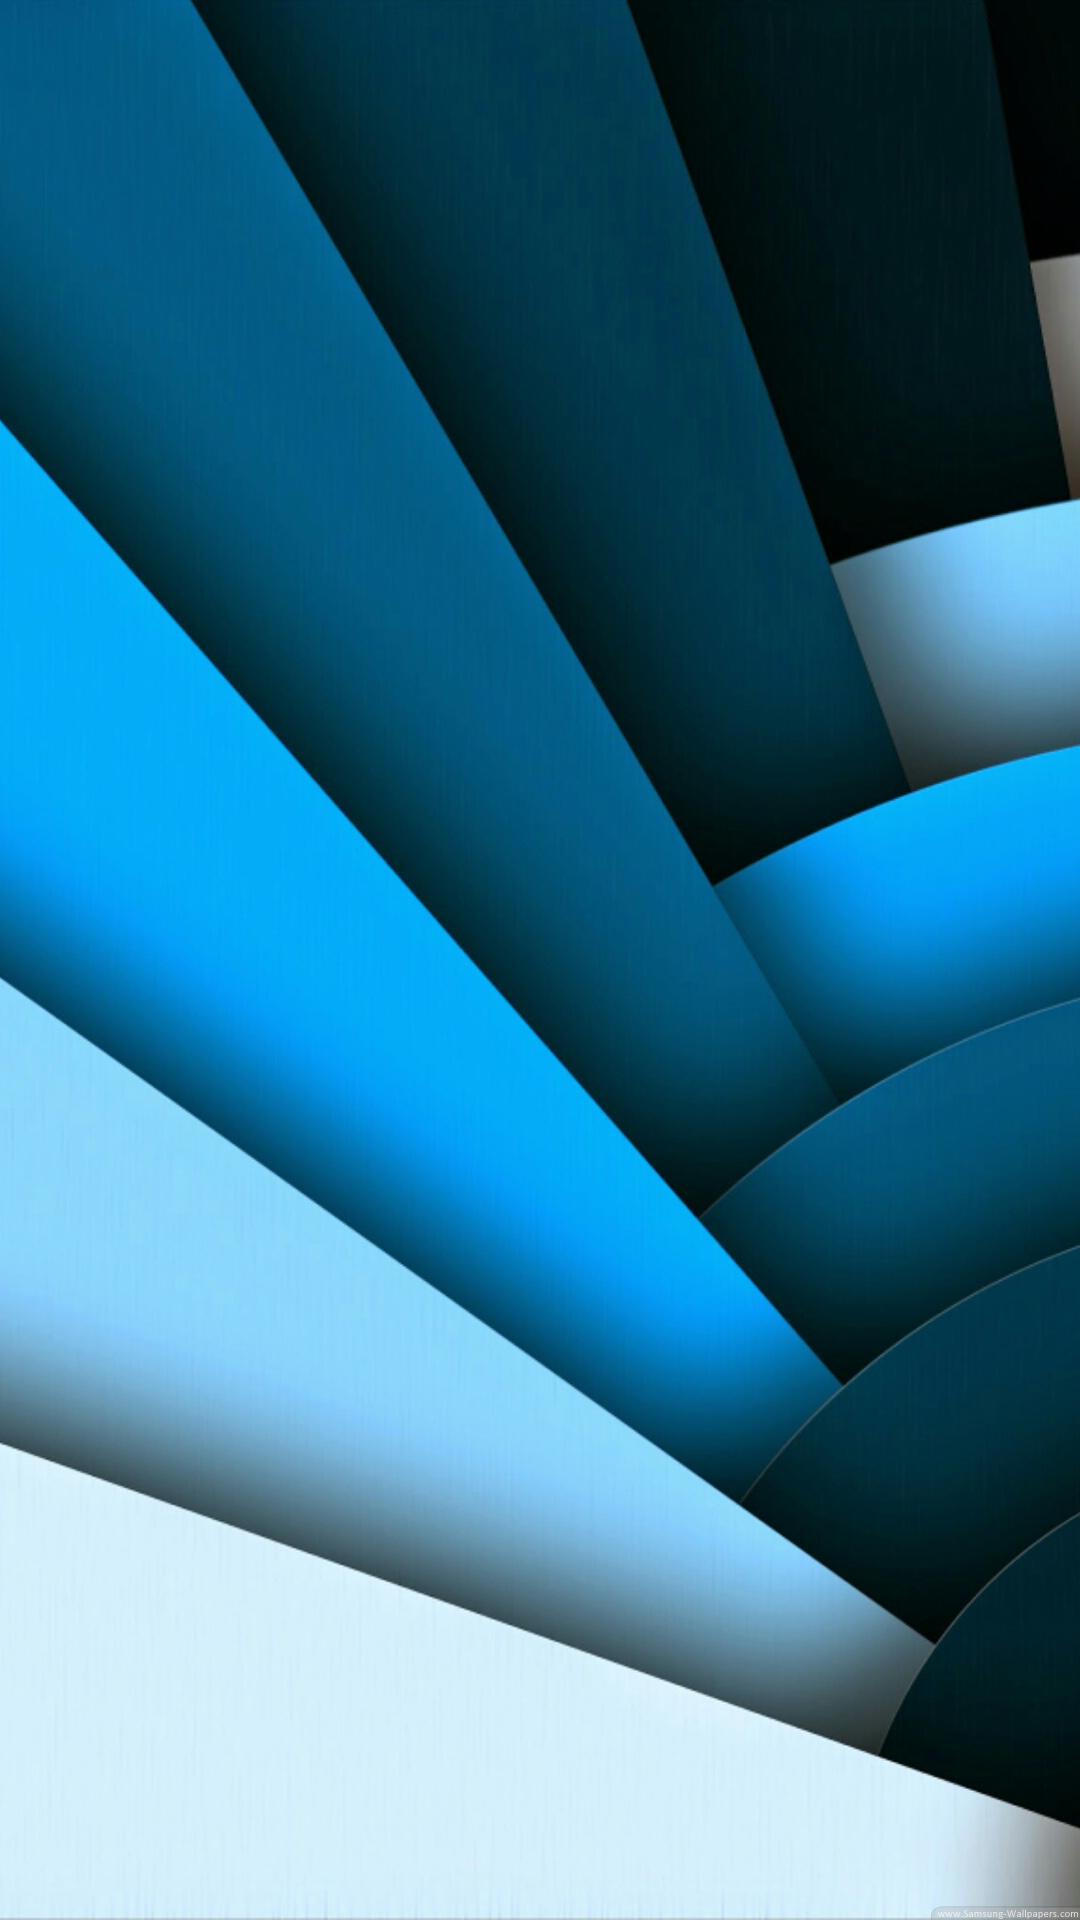 Materials Design Blue Iphone Wallpaper